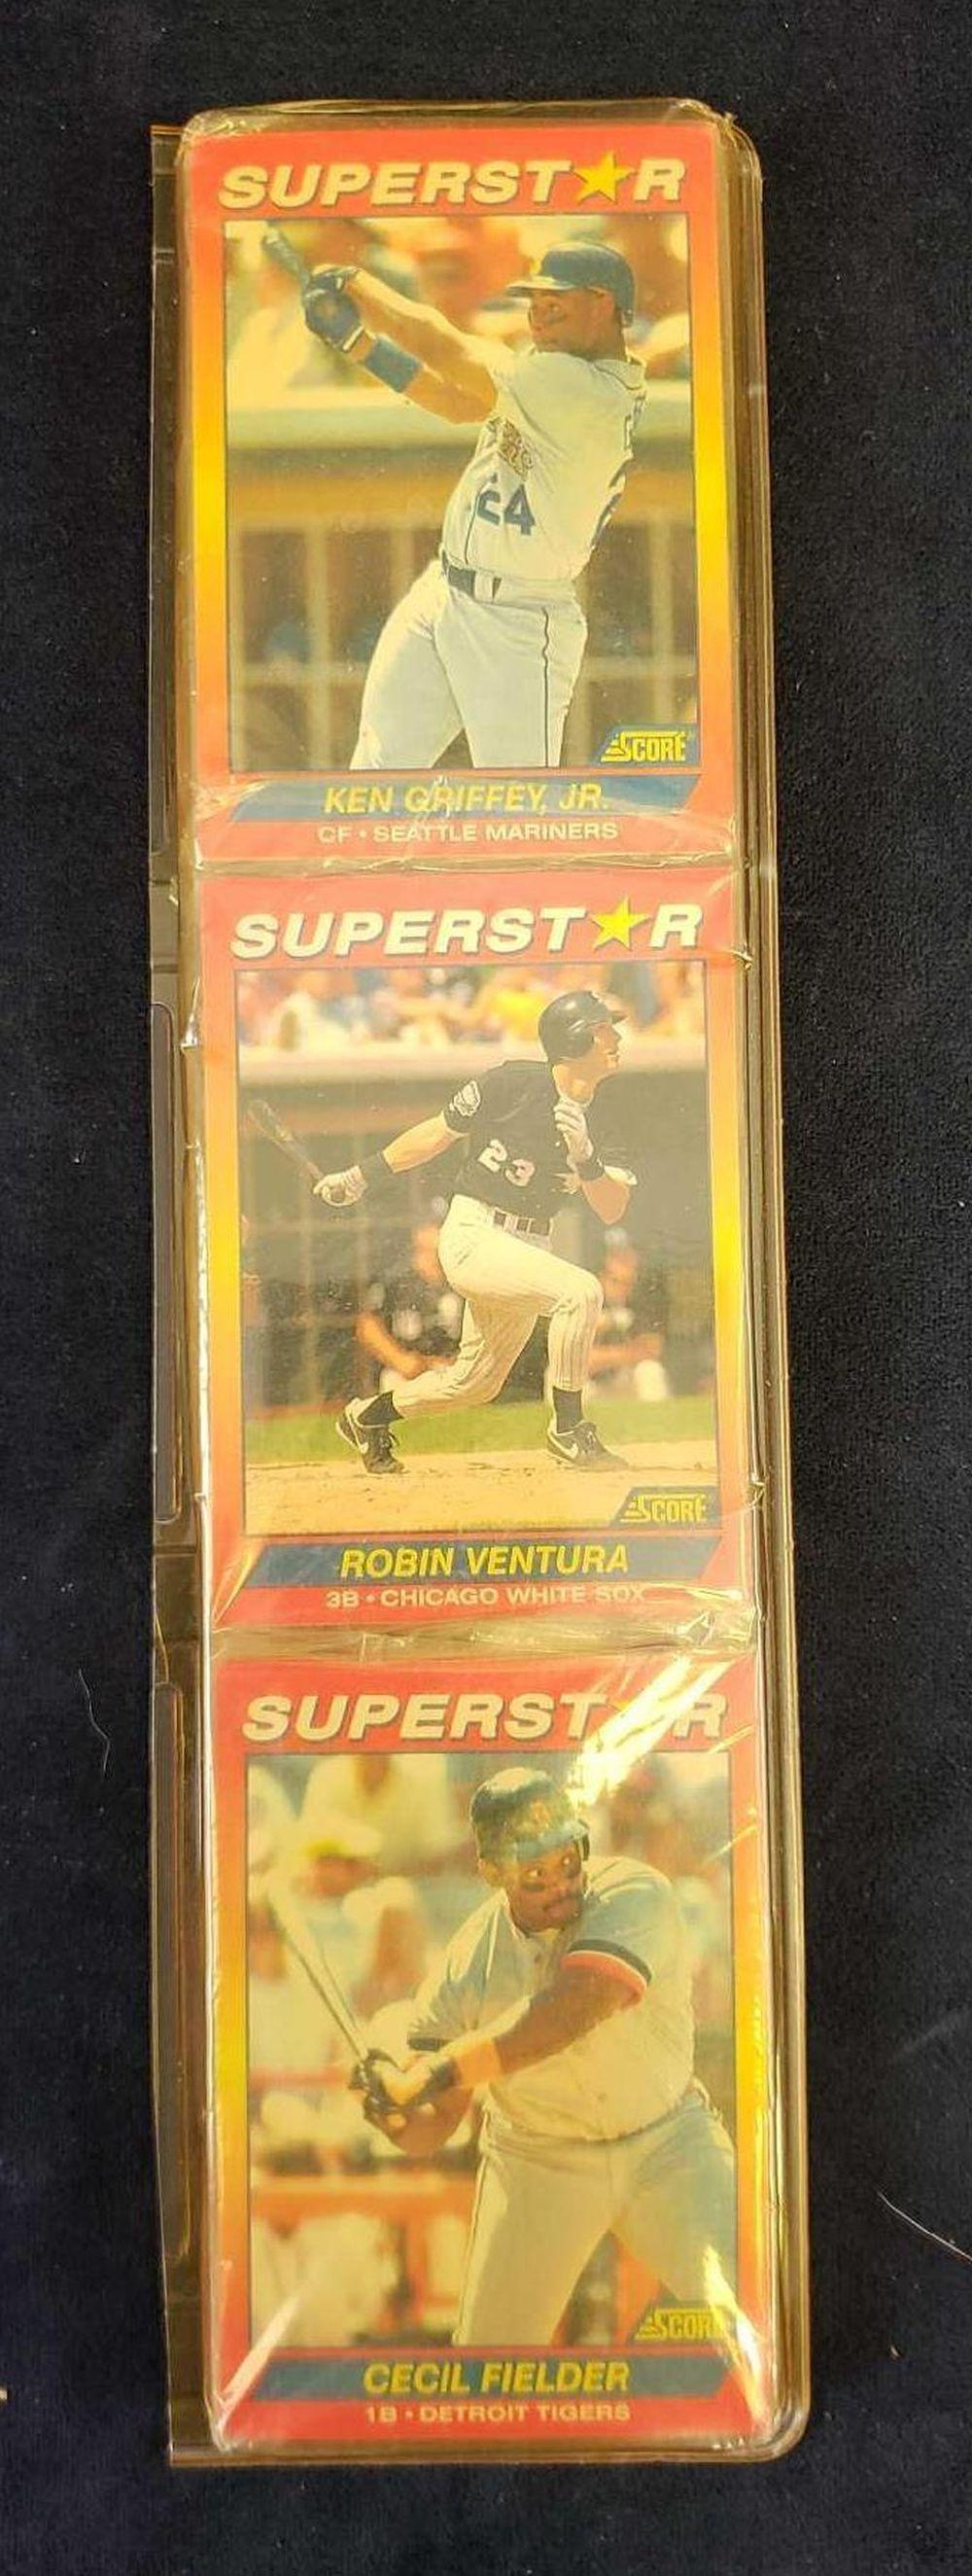 Score Superstar Unopened Baseball Cards